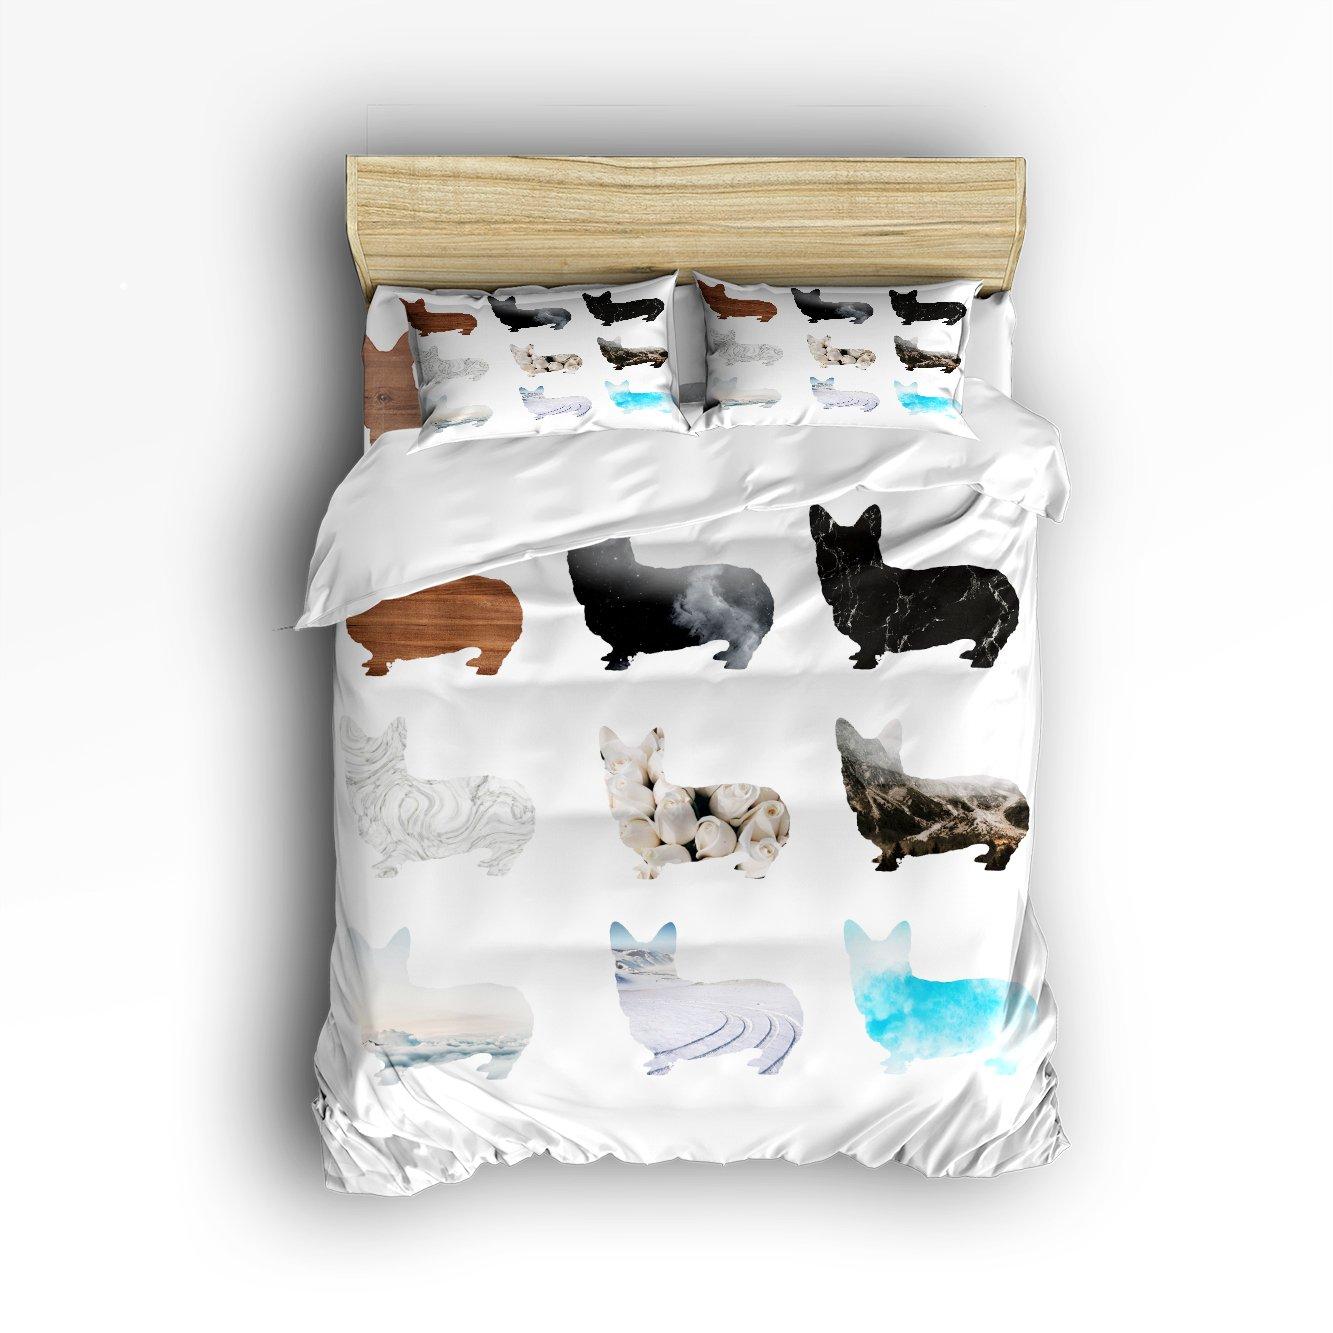 Libaoge 4 Piece Bed Sheets Set, Abstract Shape of Corgi Print, 1 Flat Sheet 1 Duvet Cover and 2 Pillow Cases